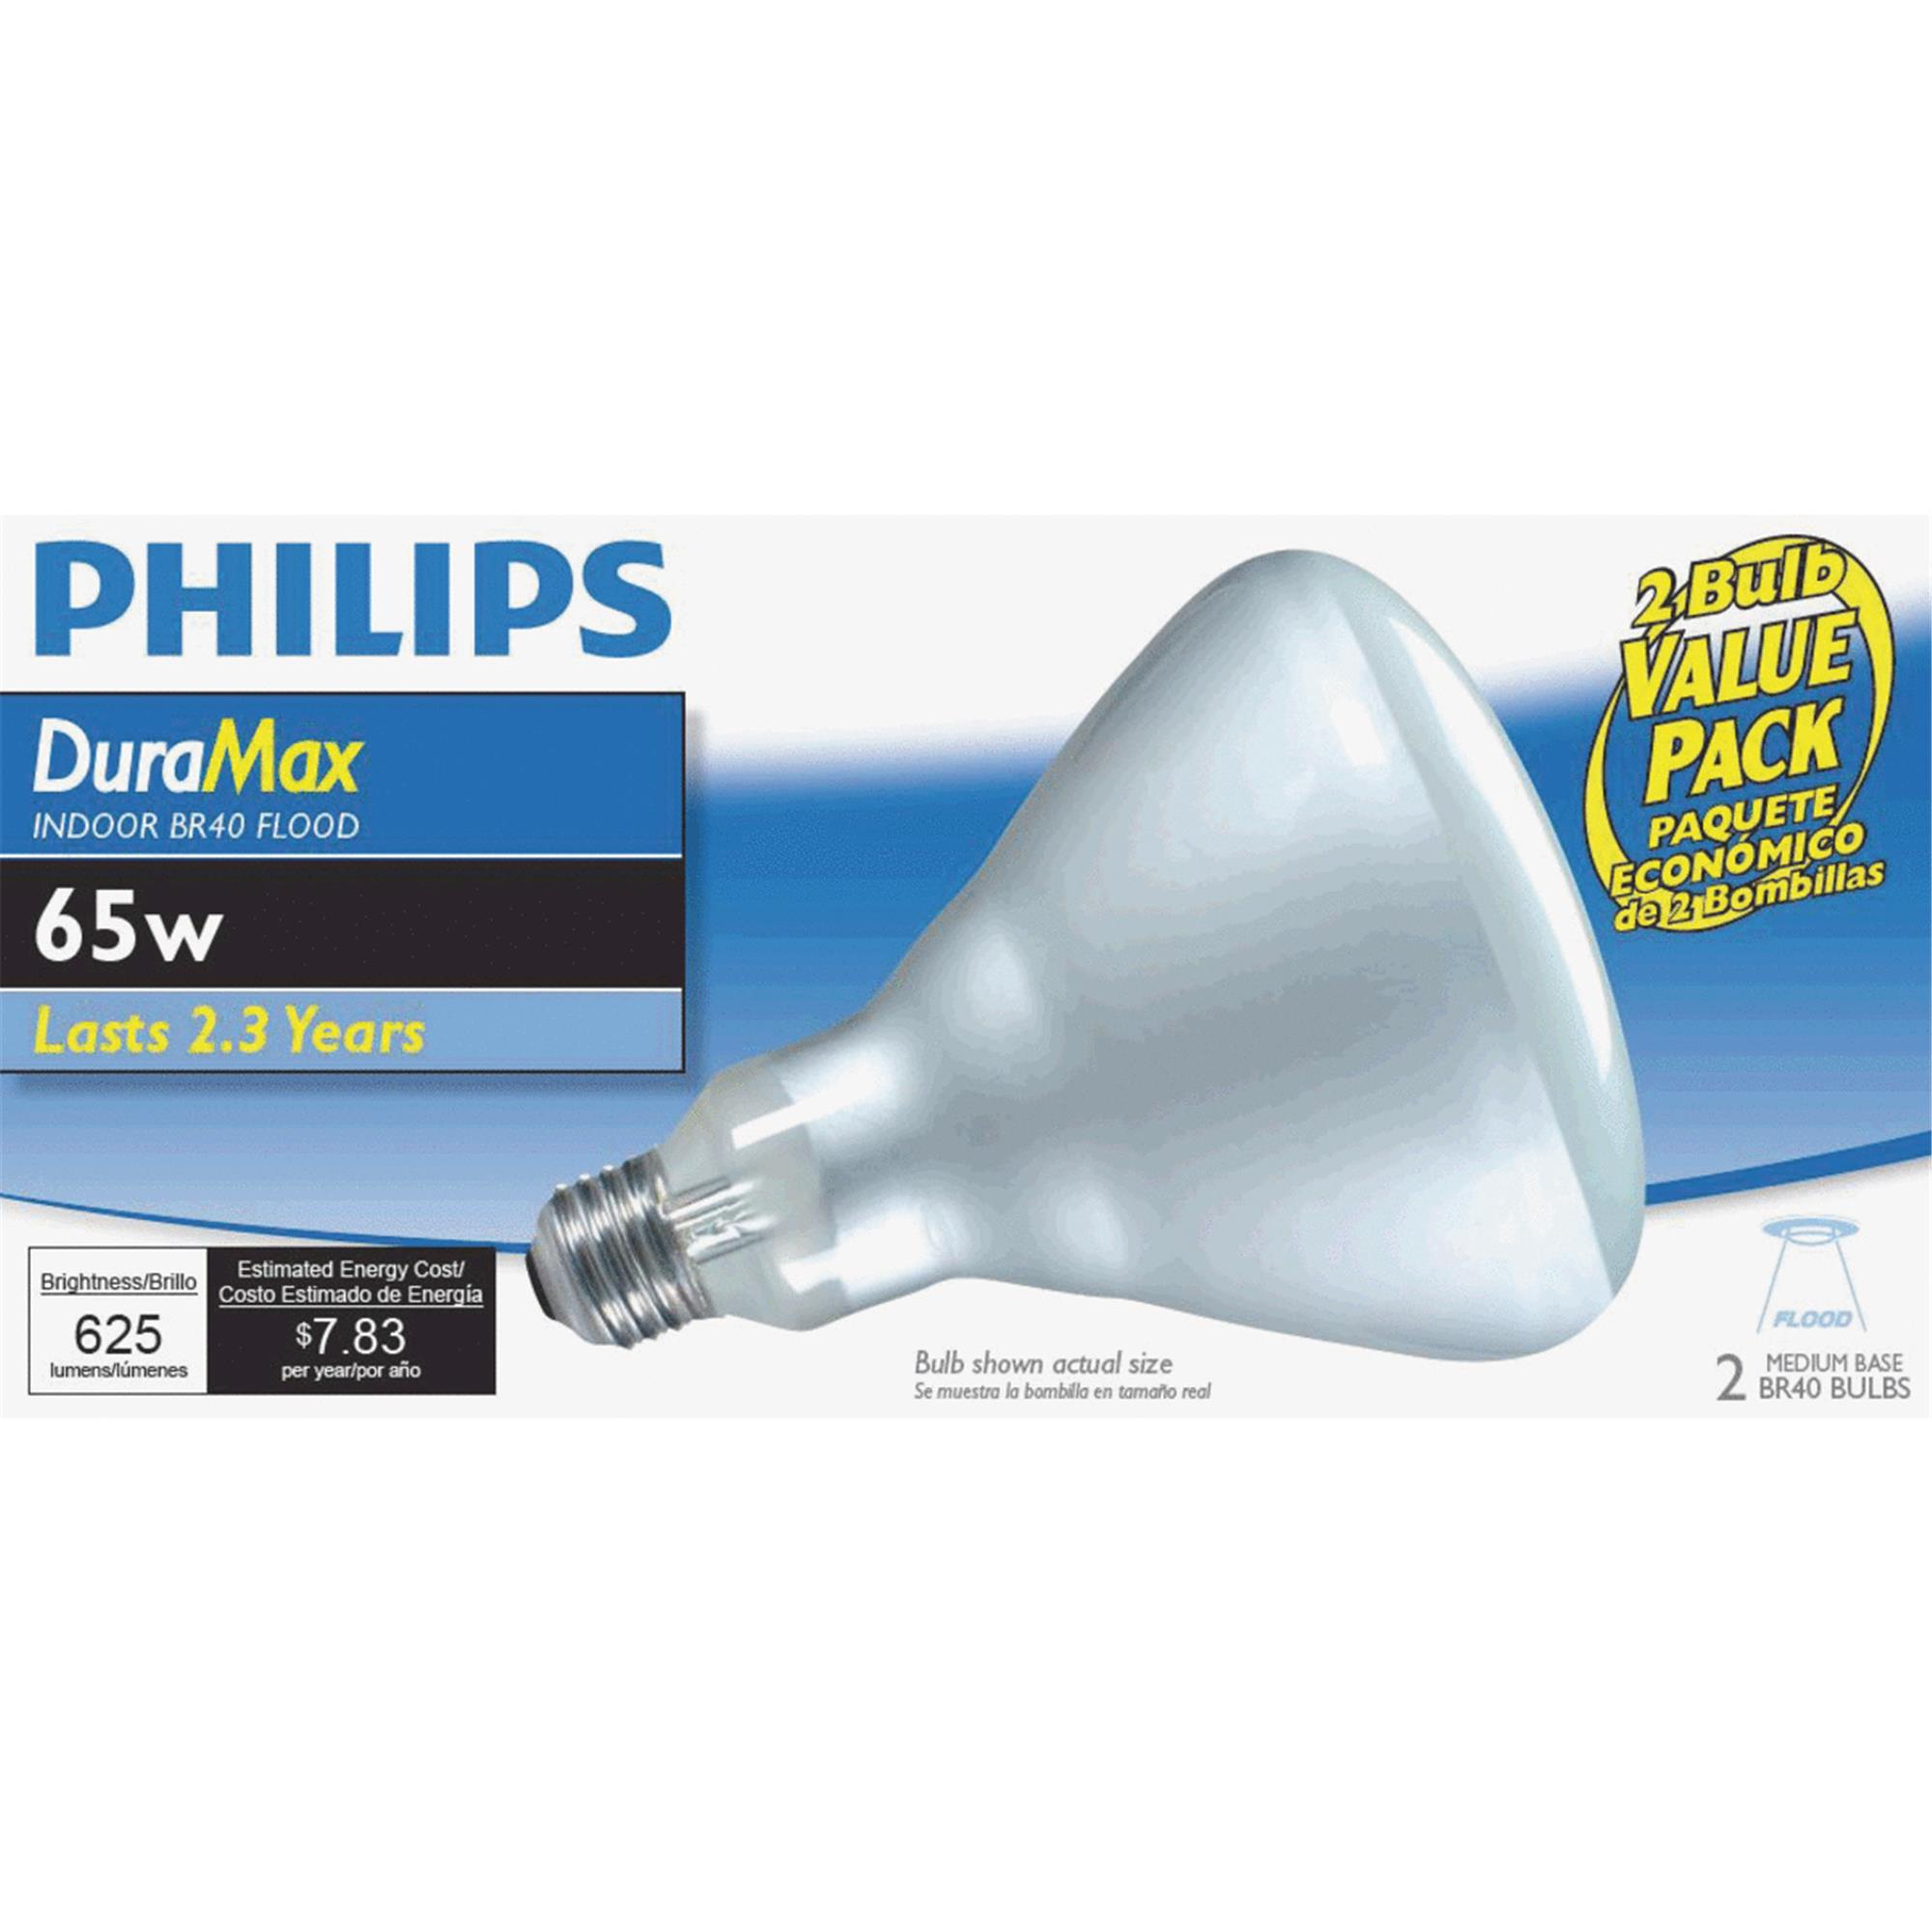 Philips Duramax Incandescent Floodlight Light Bulb, 65W, 2-count